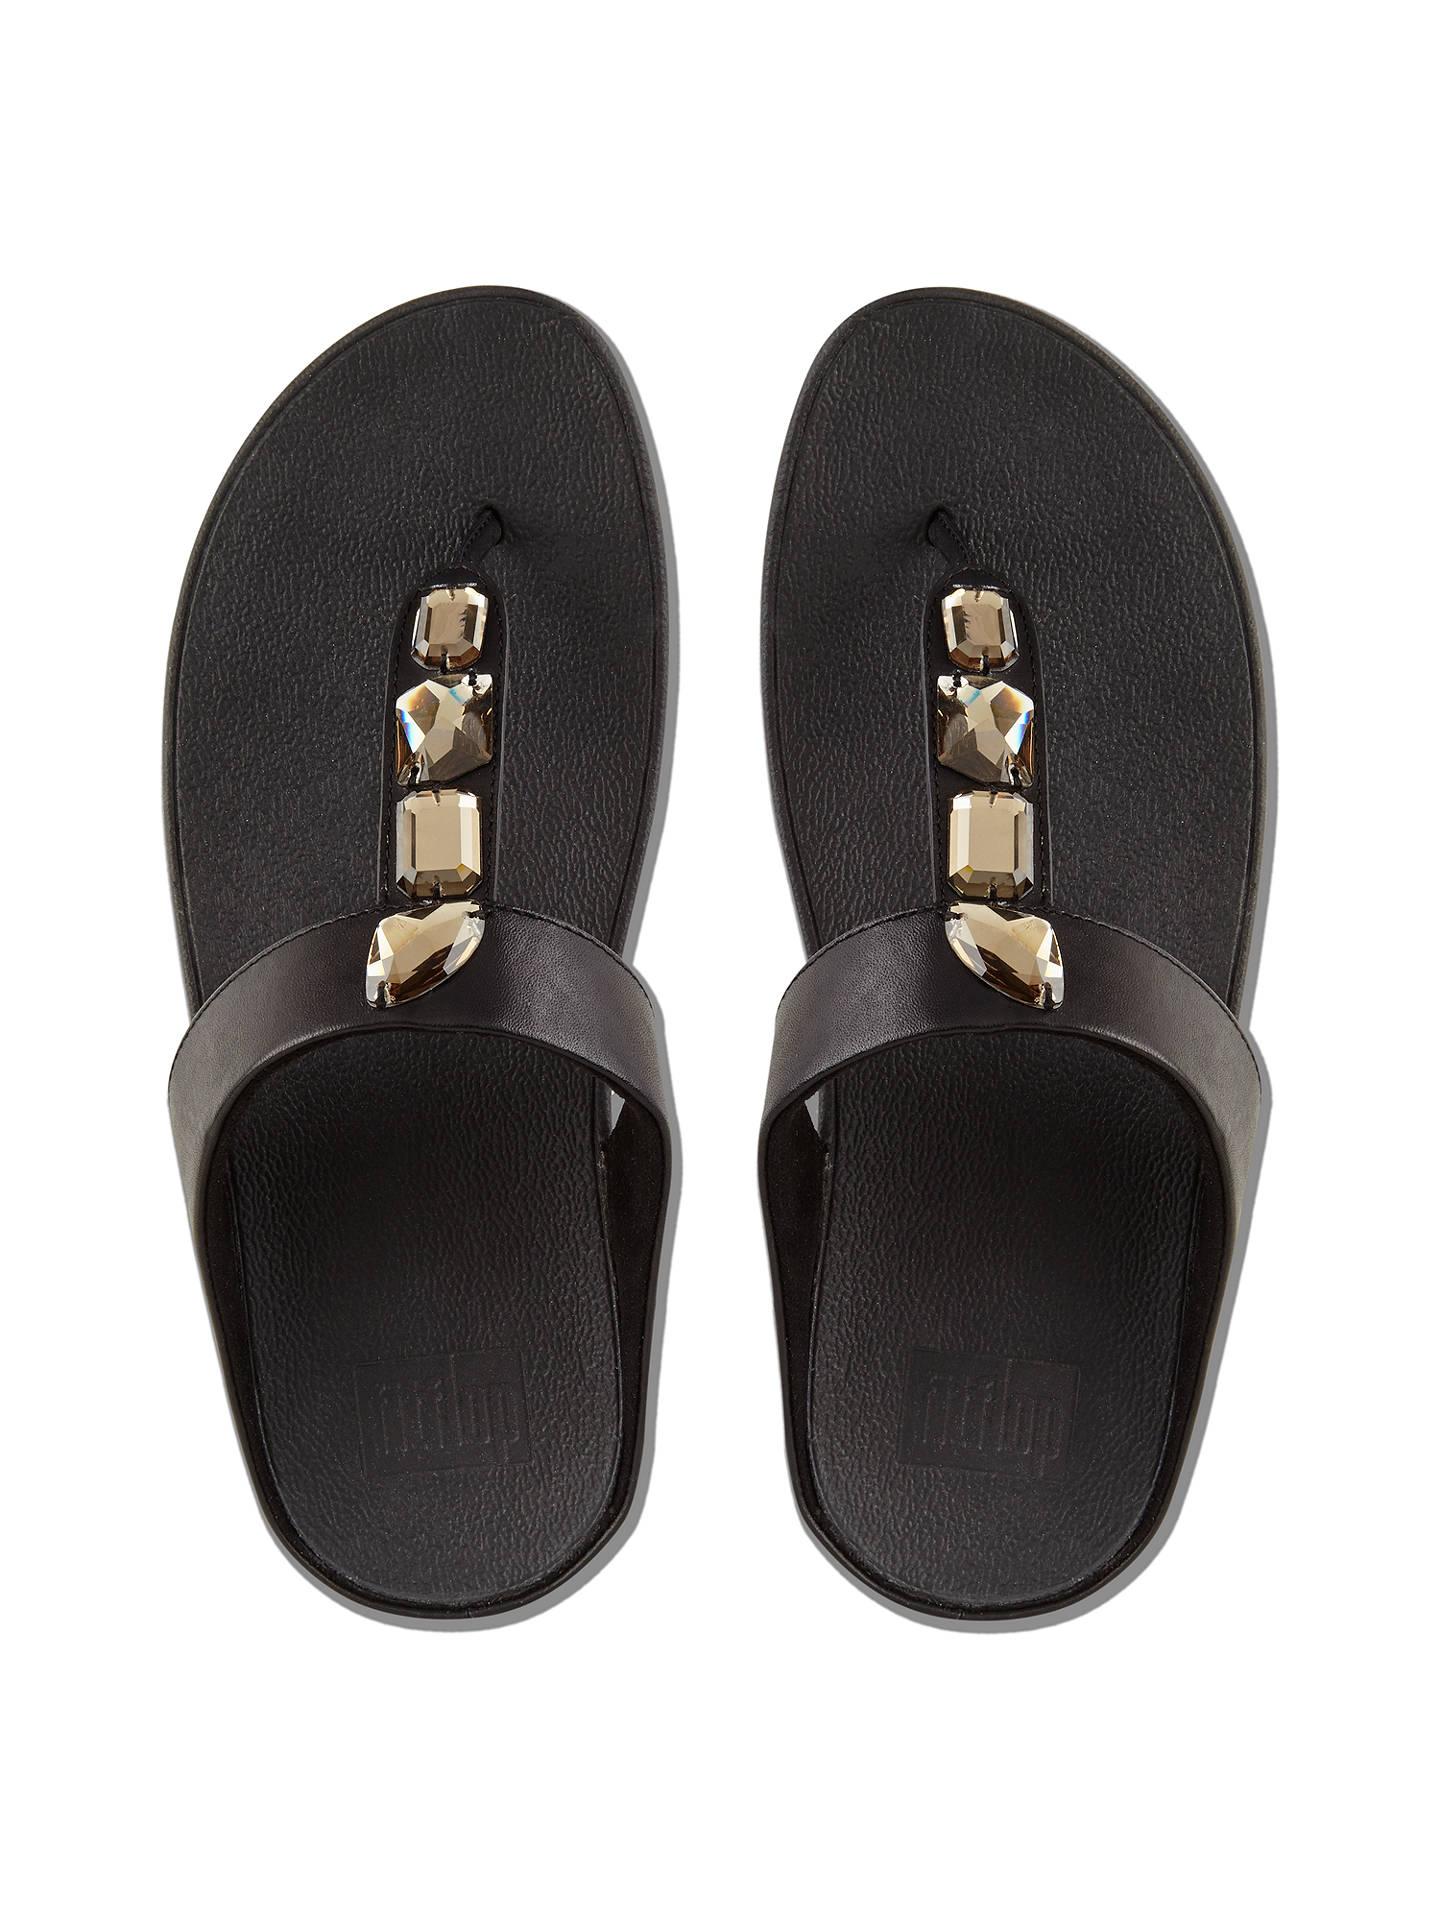 c1e598629 FitFlop Roka Embellished Toe Post Sandals at John Lewis   Partners